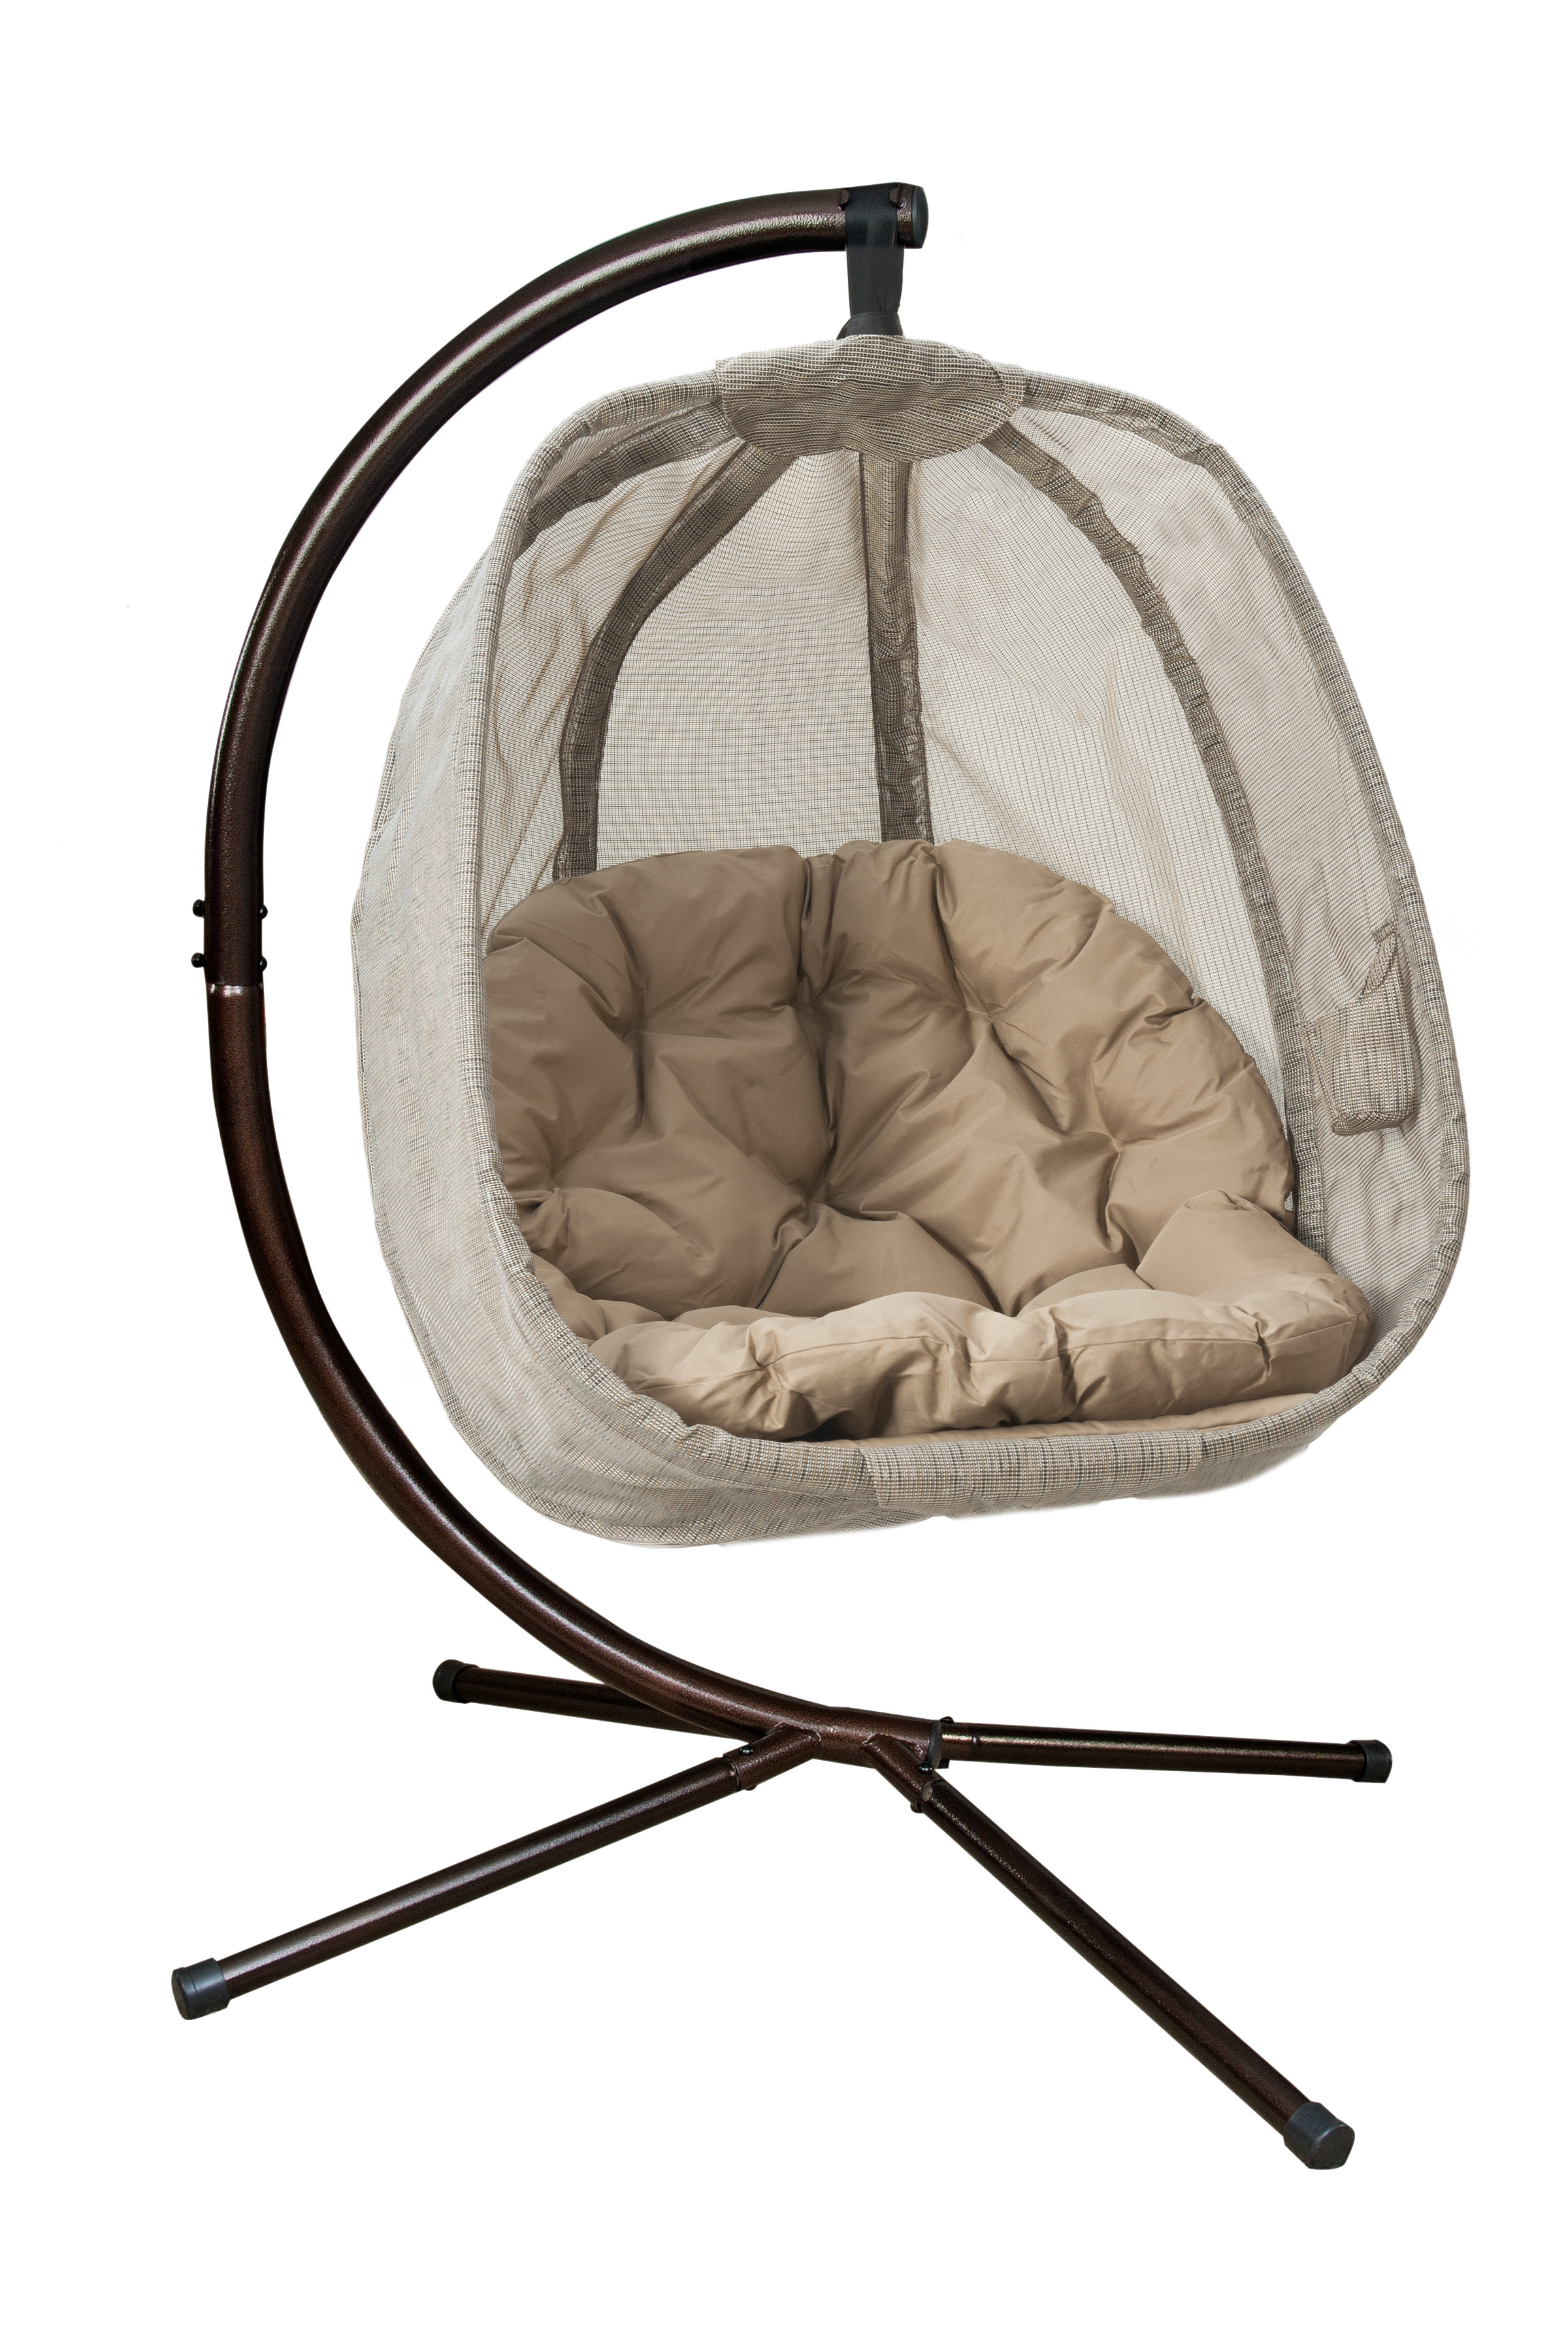 Strange Flowerhouse Hanging Egg Chair W Stand Walmart Com Andrewgaddart Wooden Chair Designs For Living Room Andrewgaddartcom